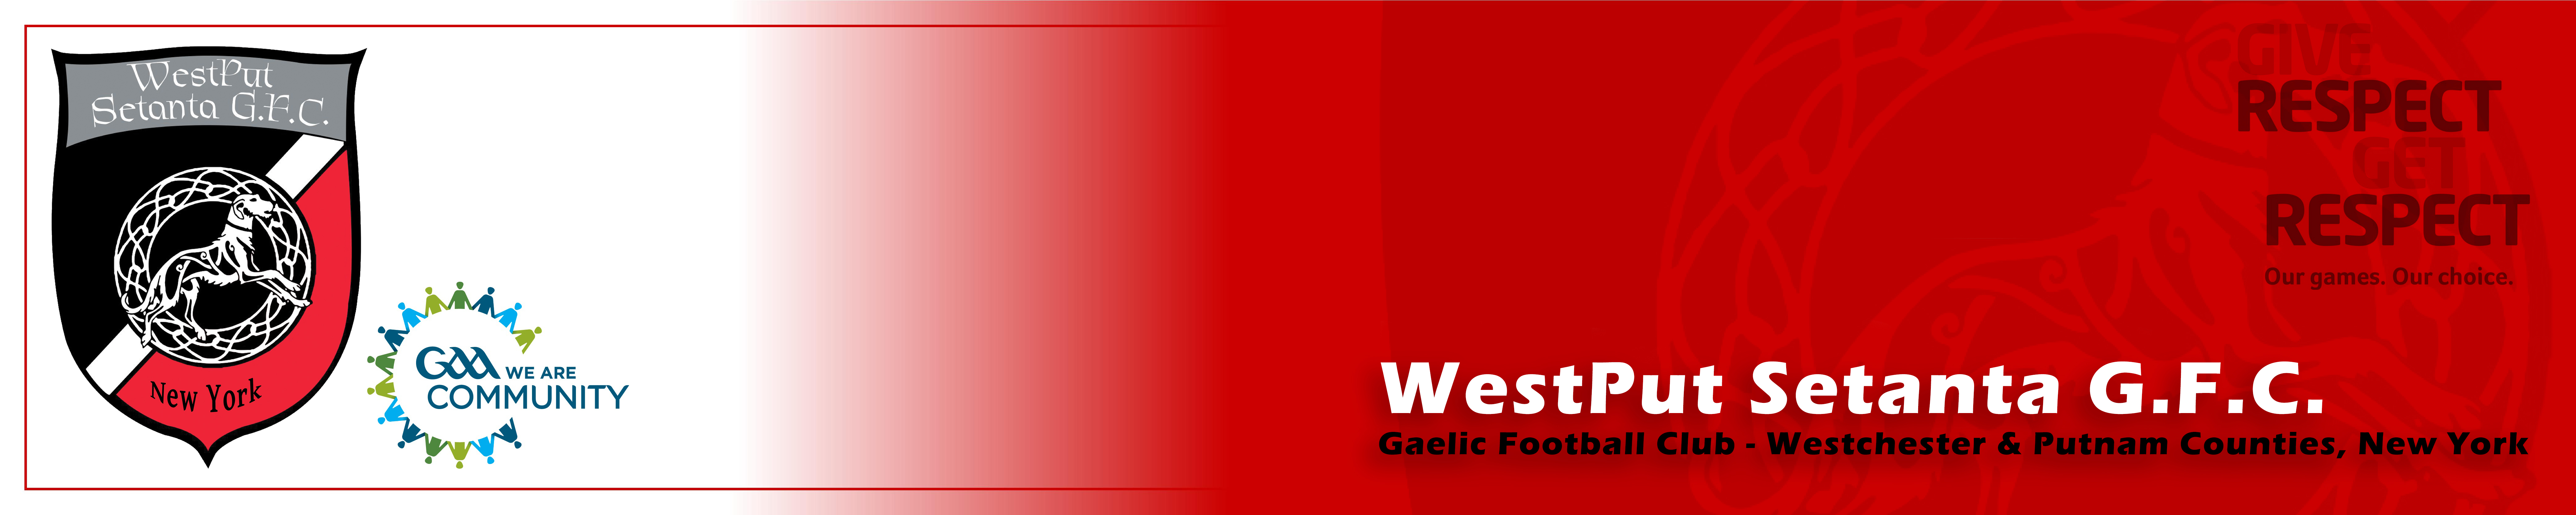 WestPut Setanta, Gaelic Football, Goal, Field